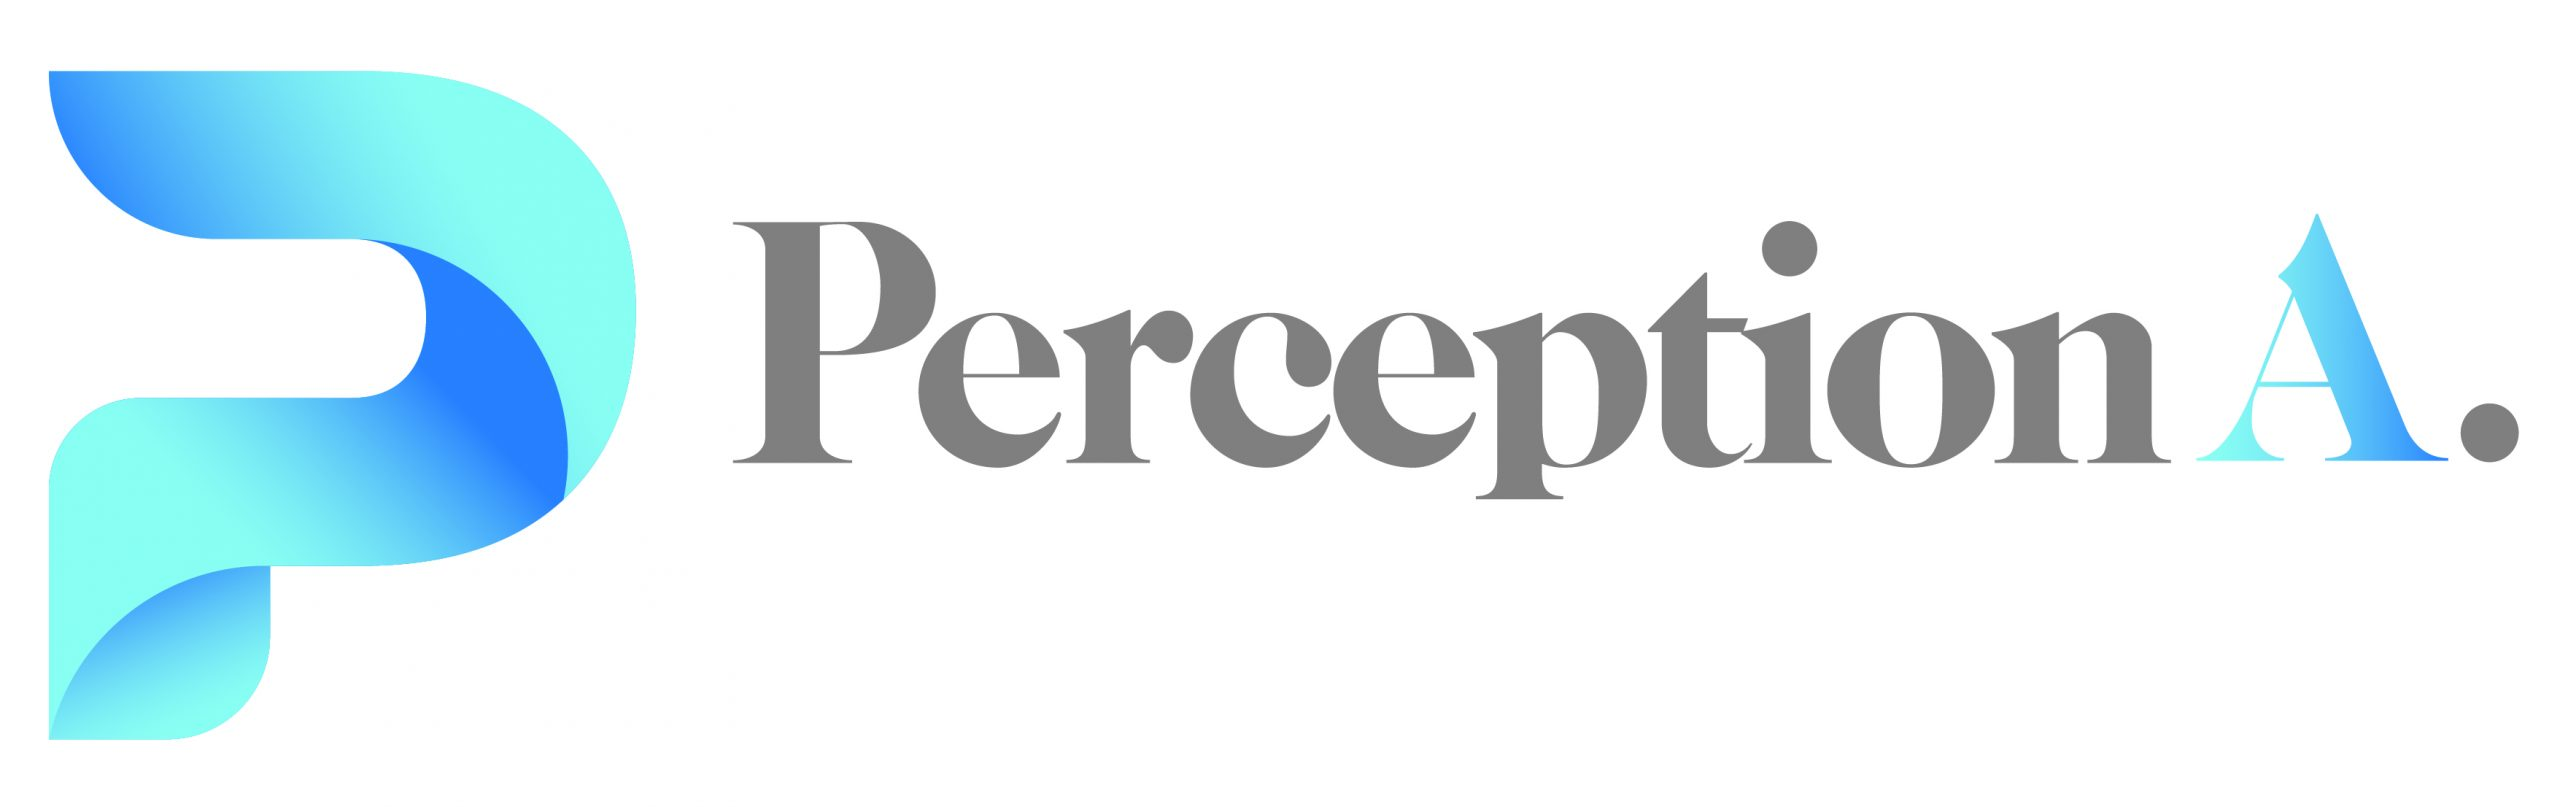 Perception A